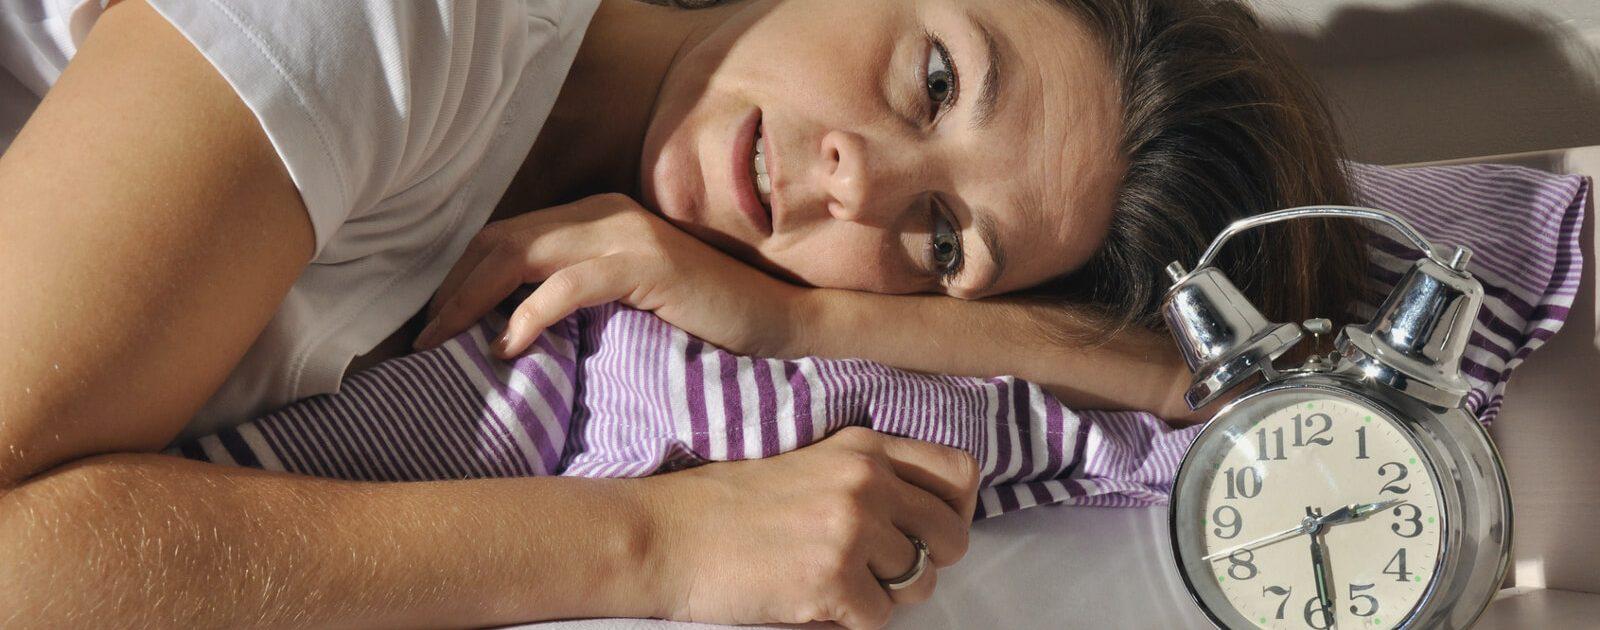 Schwangere Frau leidet nachts unter Magenschmerzen